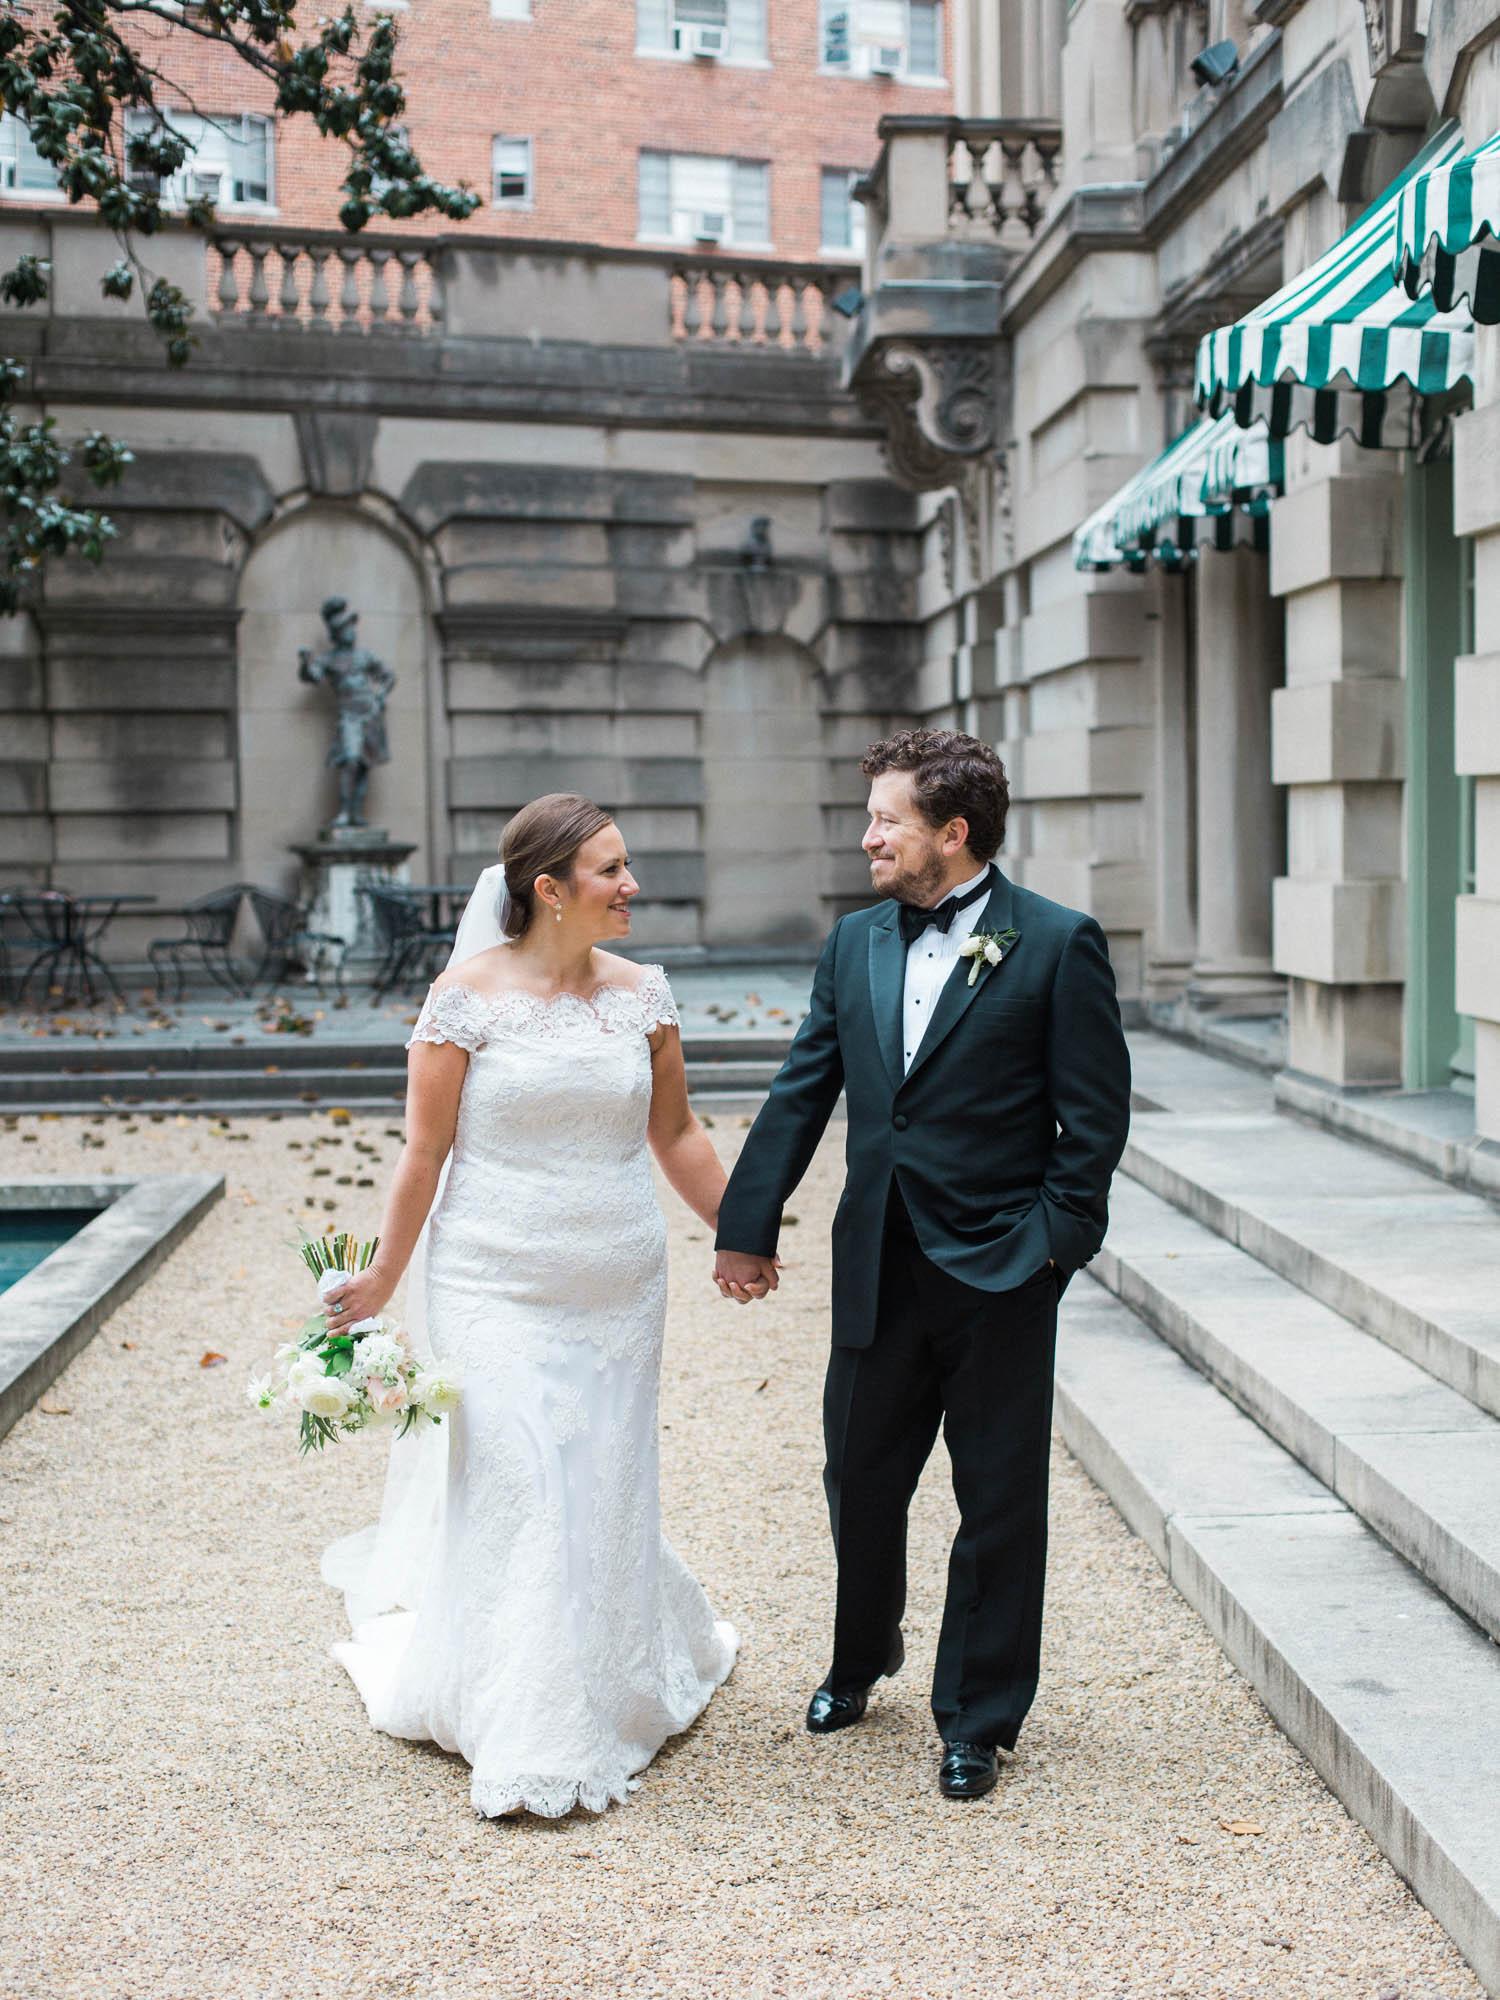 Anderson House Wedding Washington DC Fall 2017 Plume Photography